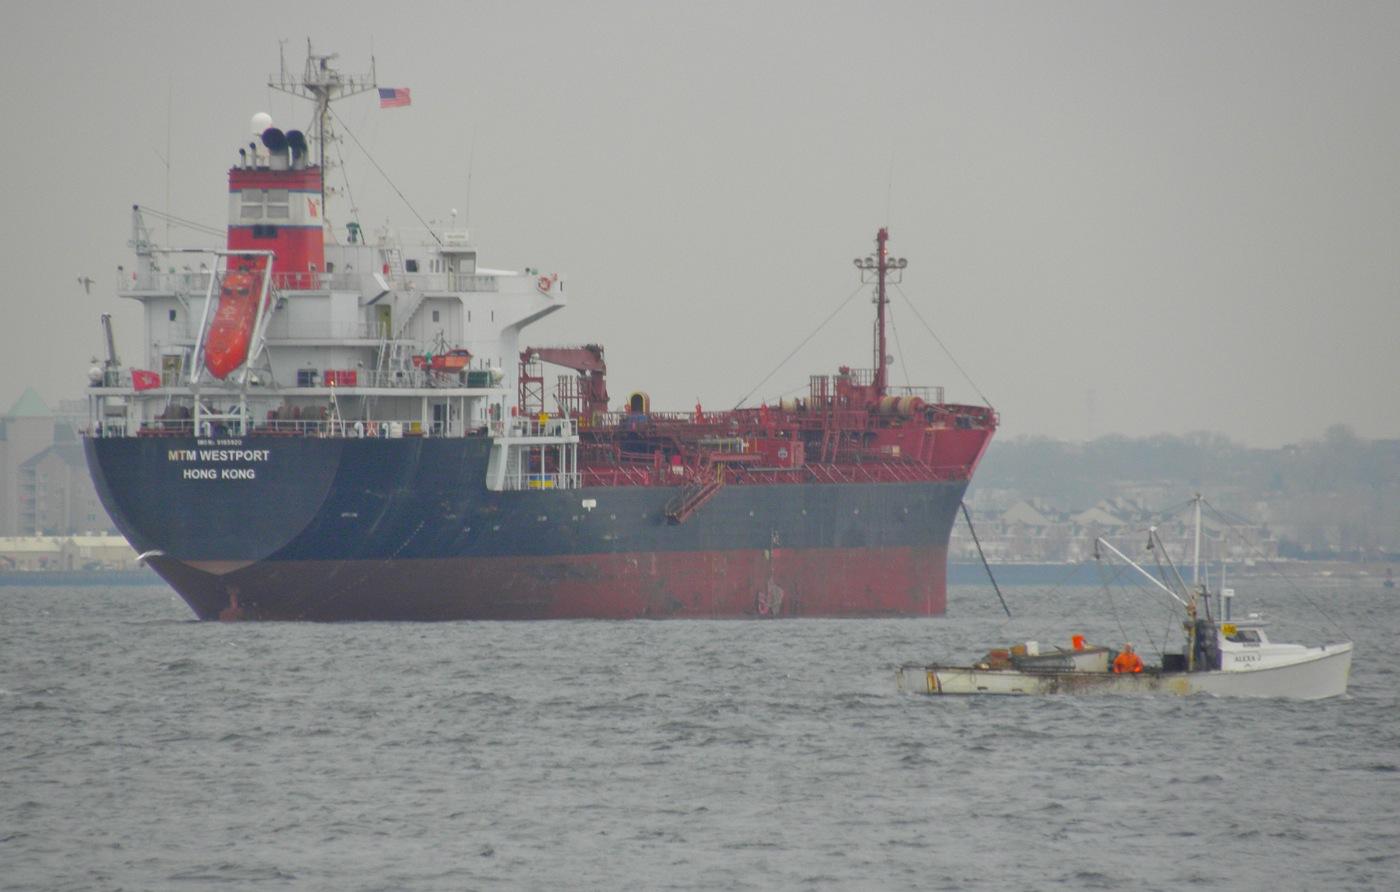 sextans vessel